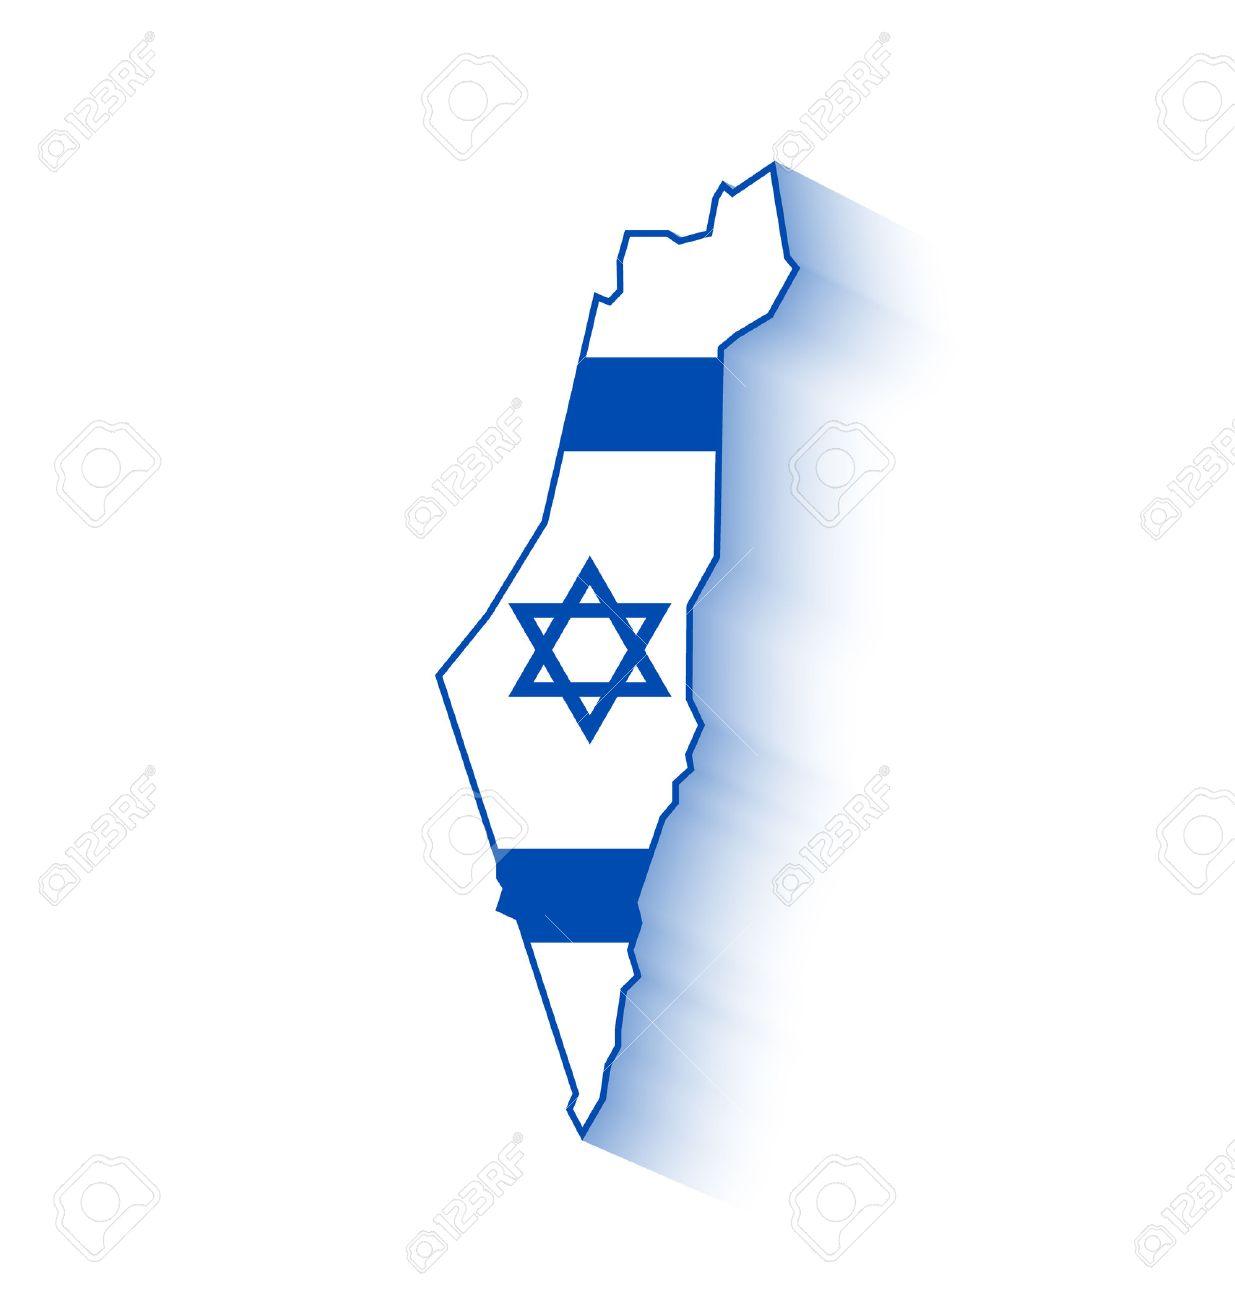 Image result for израиль карта